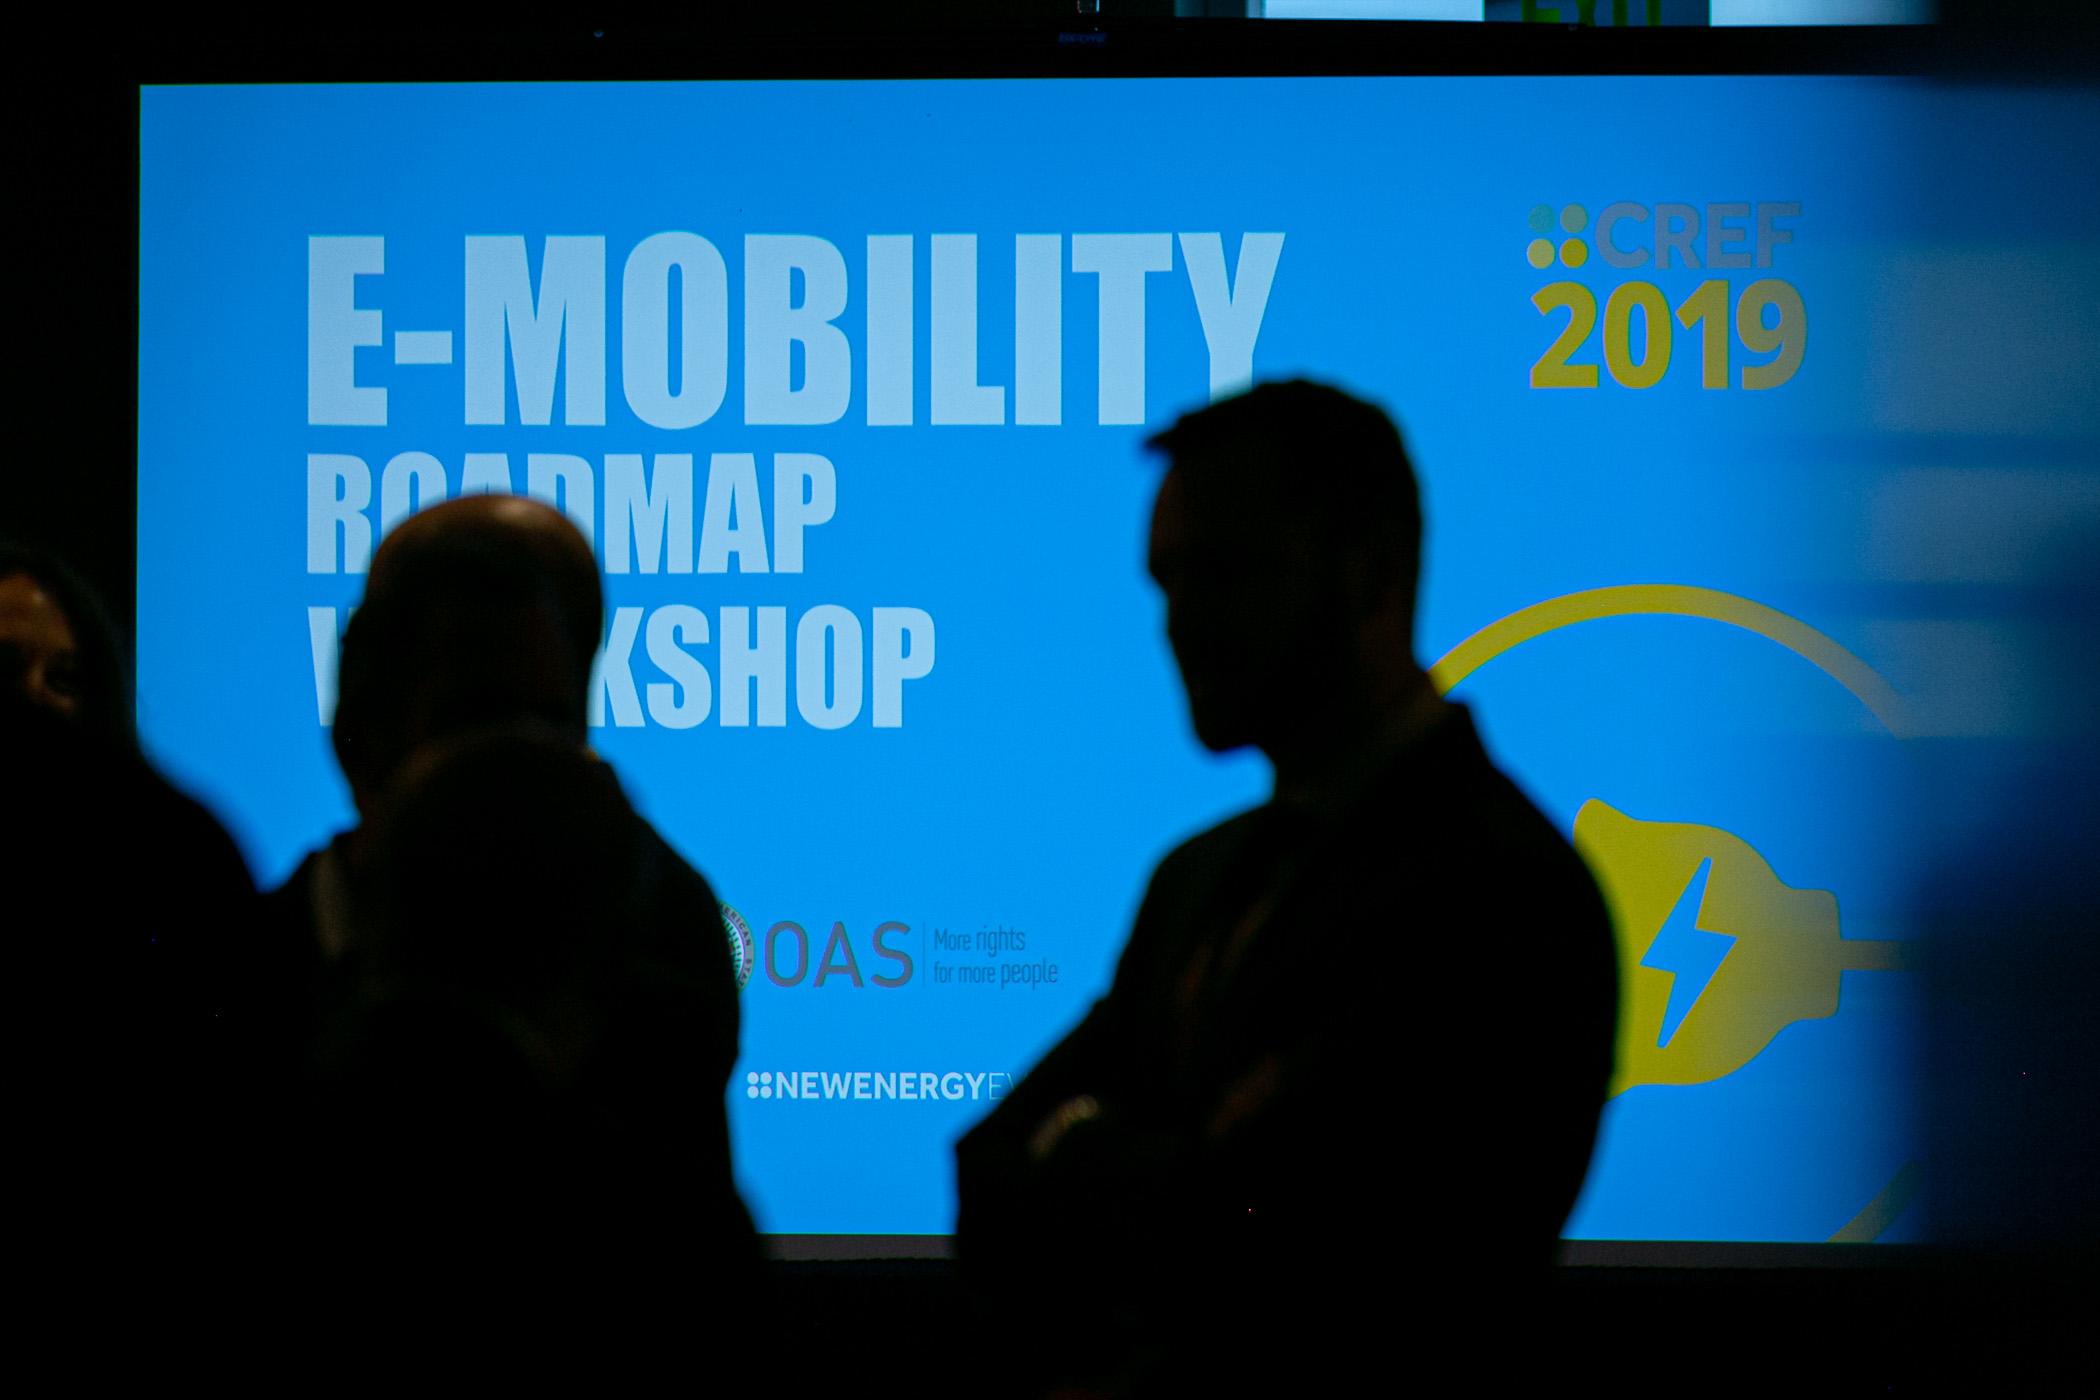 CREF 2019: E-mobility Workshop